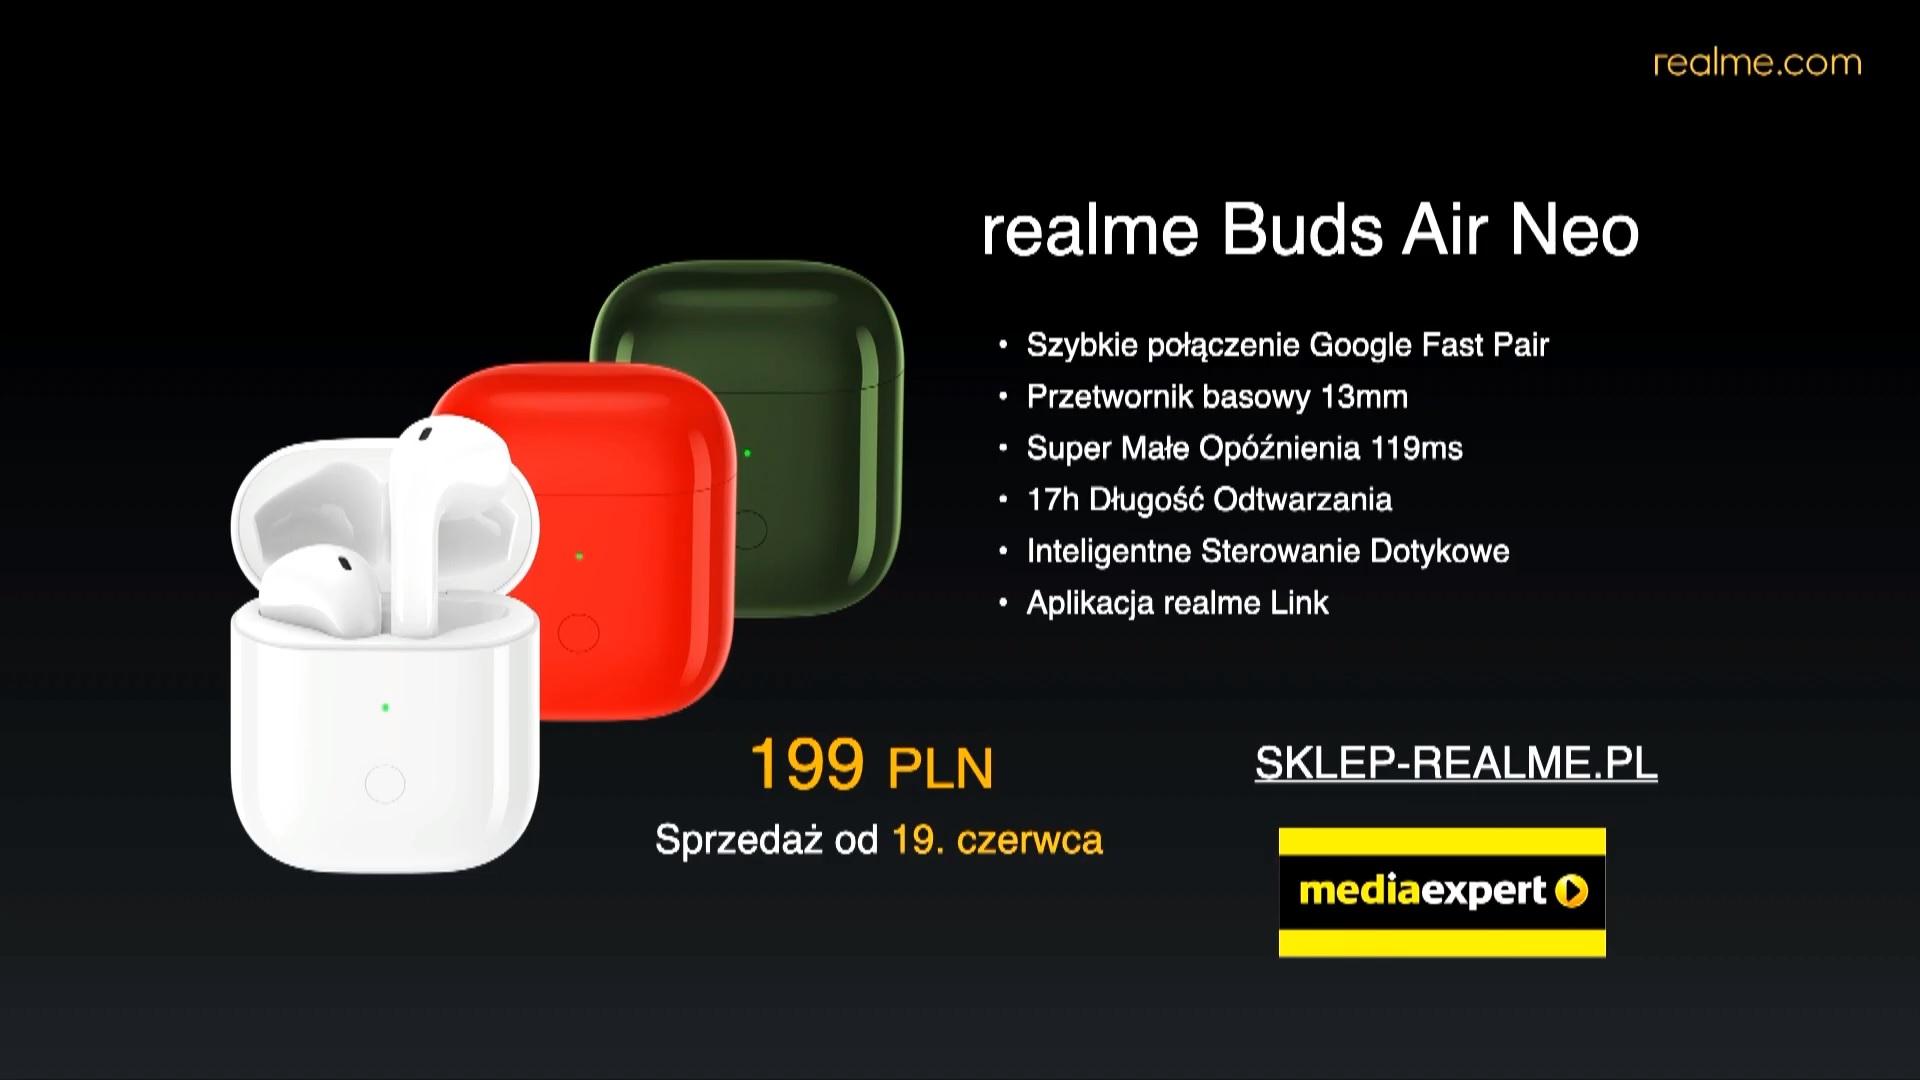 realme Buds Air Neo price Poland